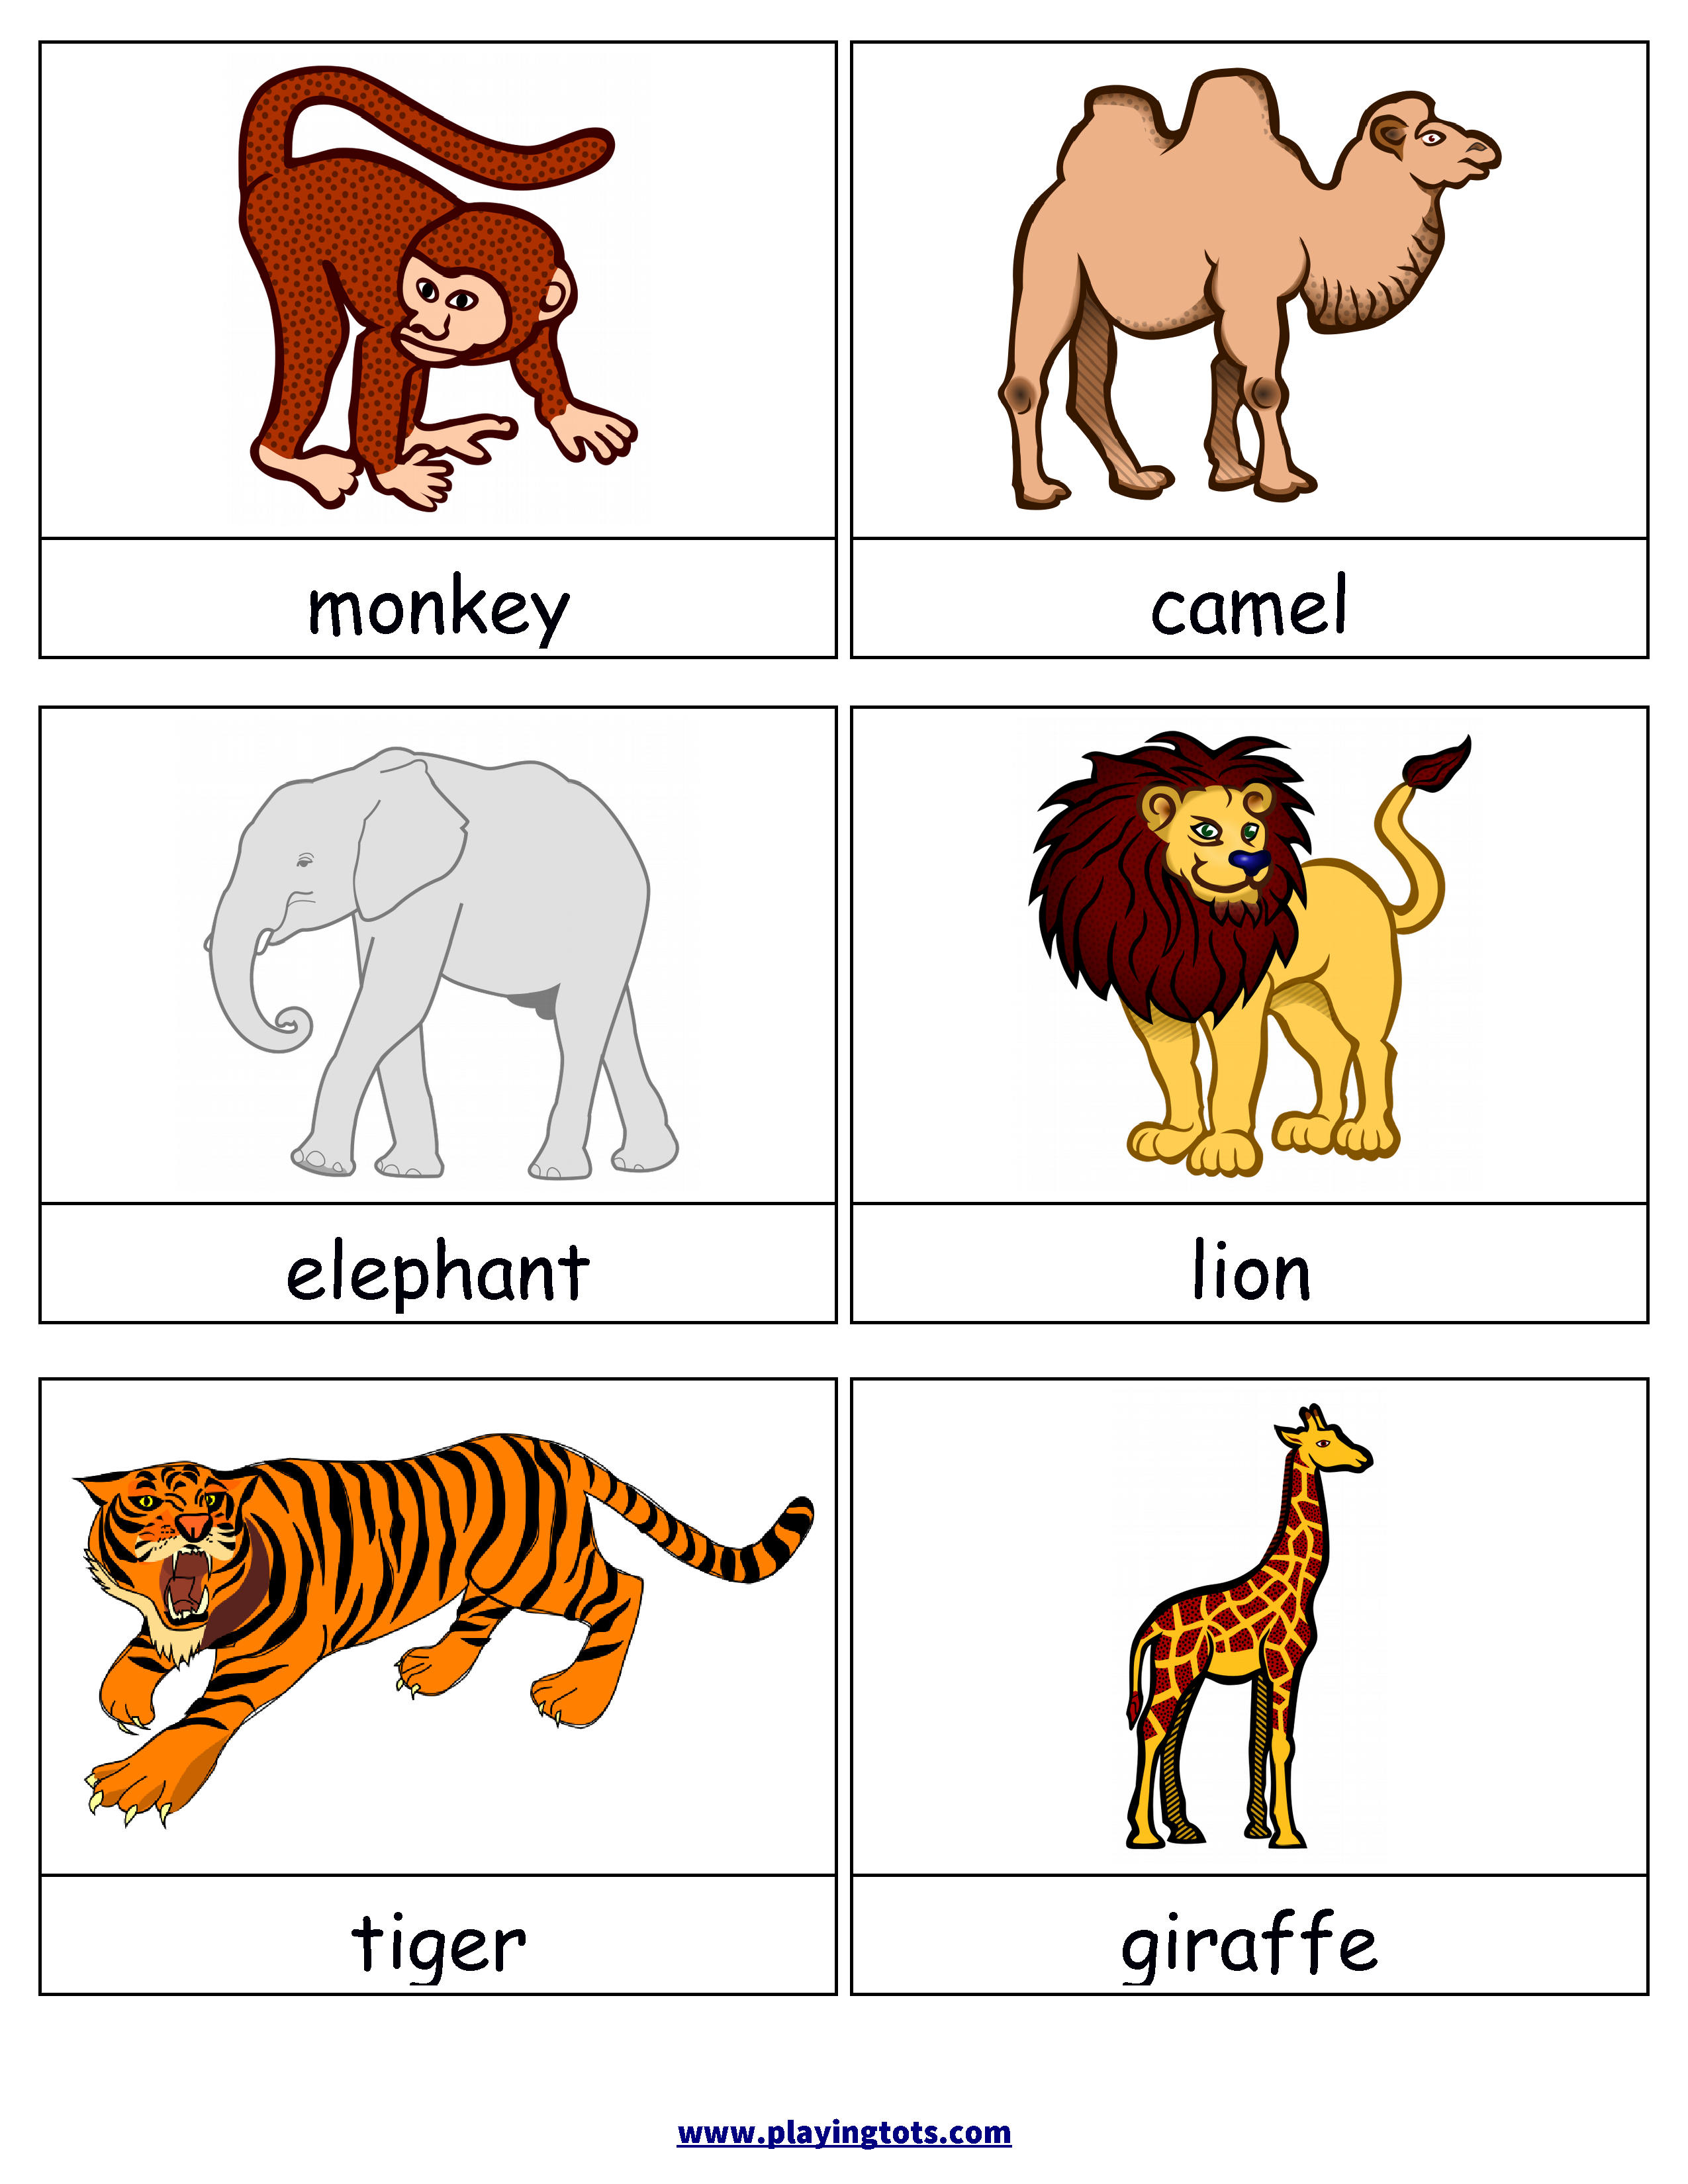 Free Printable Animals Flash Cards   Free Printable For Learning - Free Printable Animal Cards